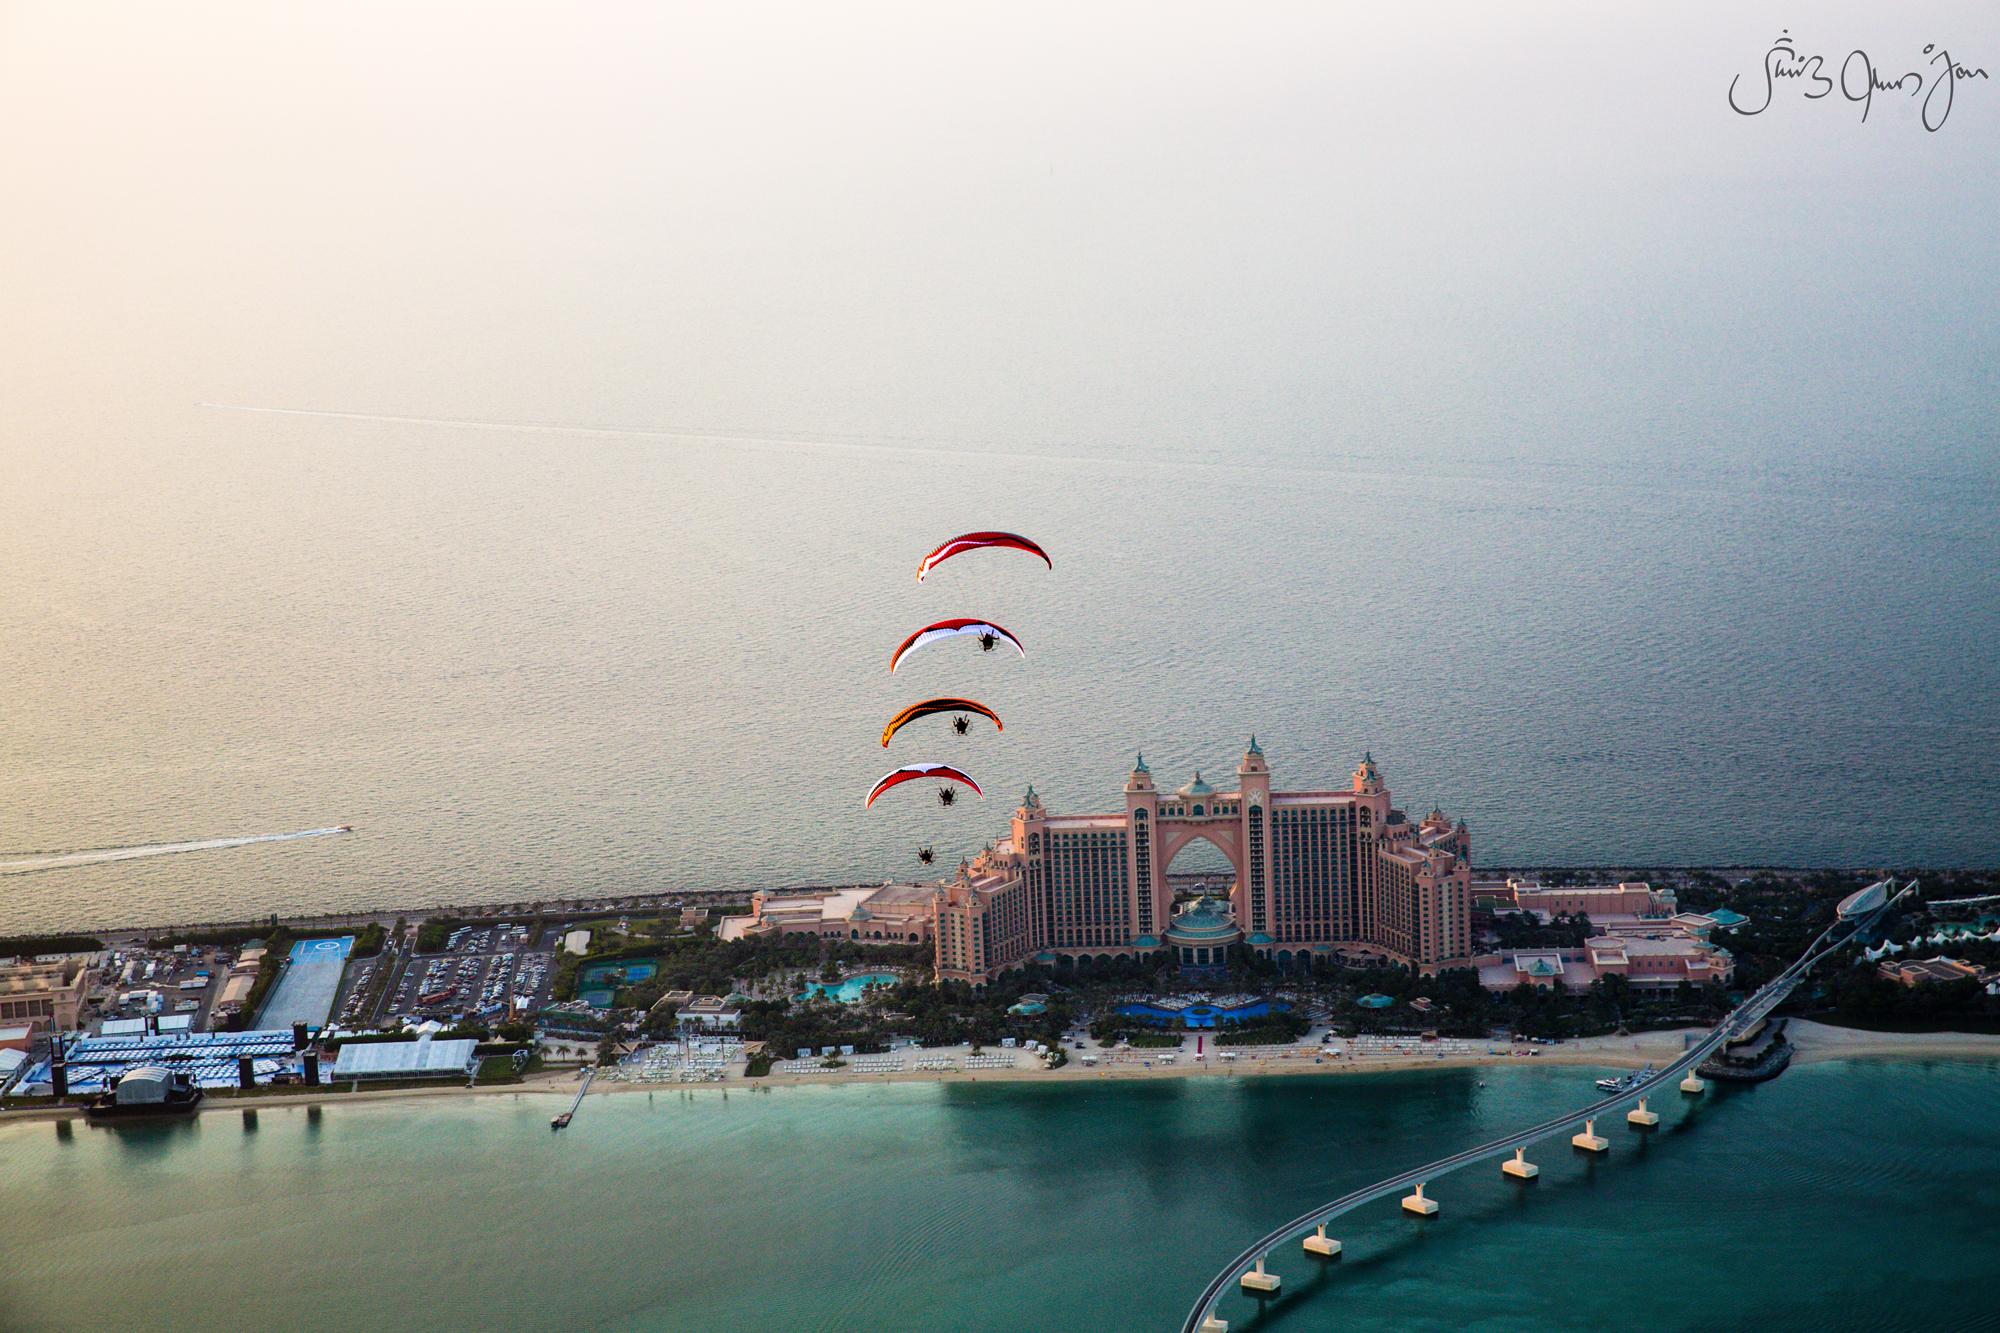 WTB-6613 Skyhub paramotors Palm Dubai marina Francois ragolski Martin schricke